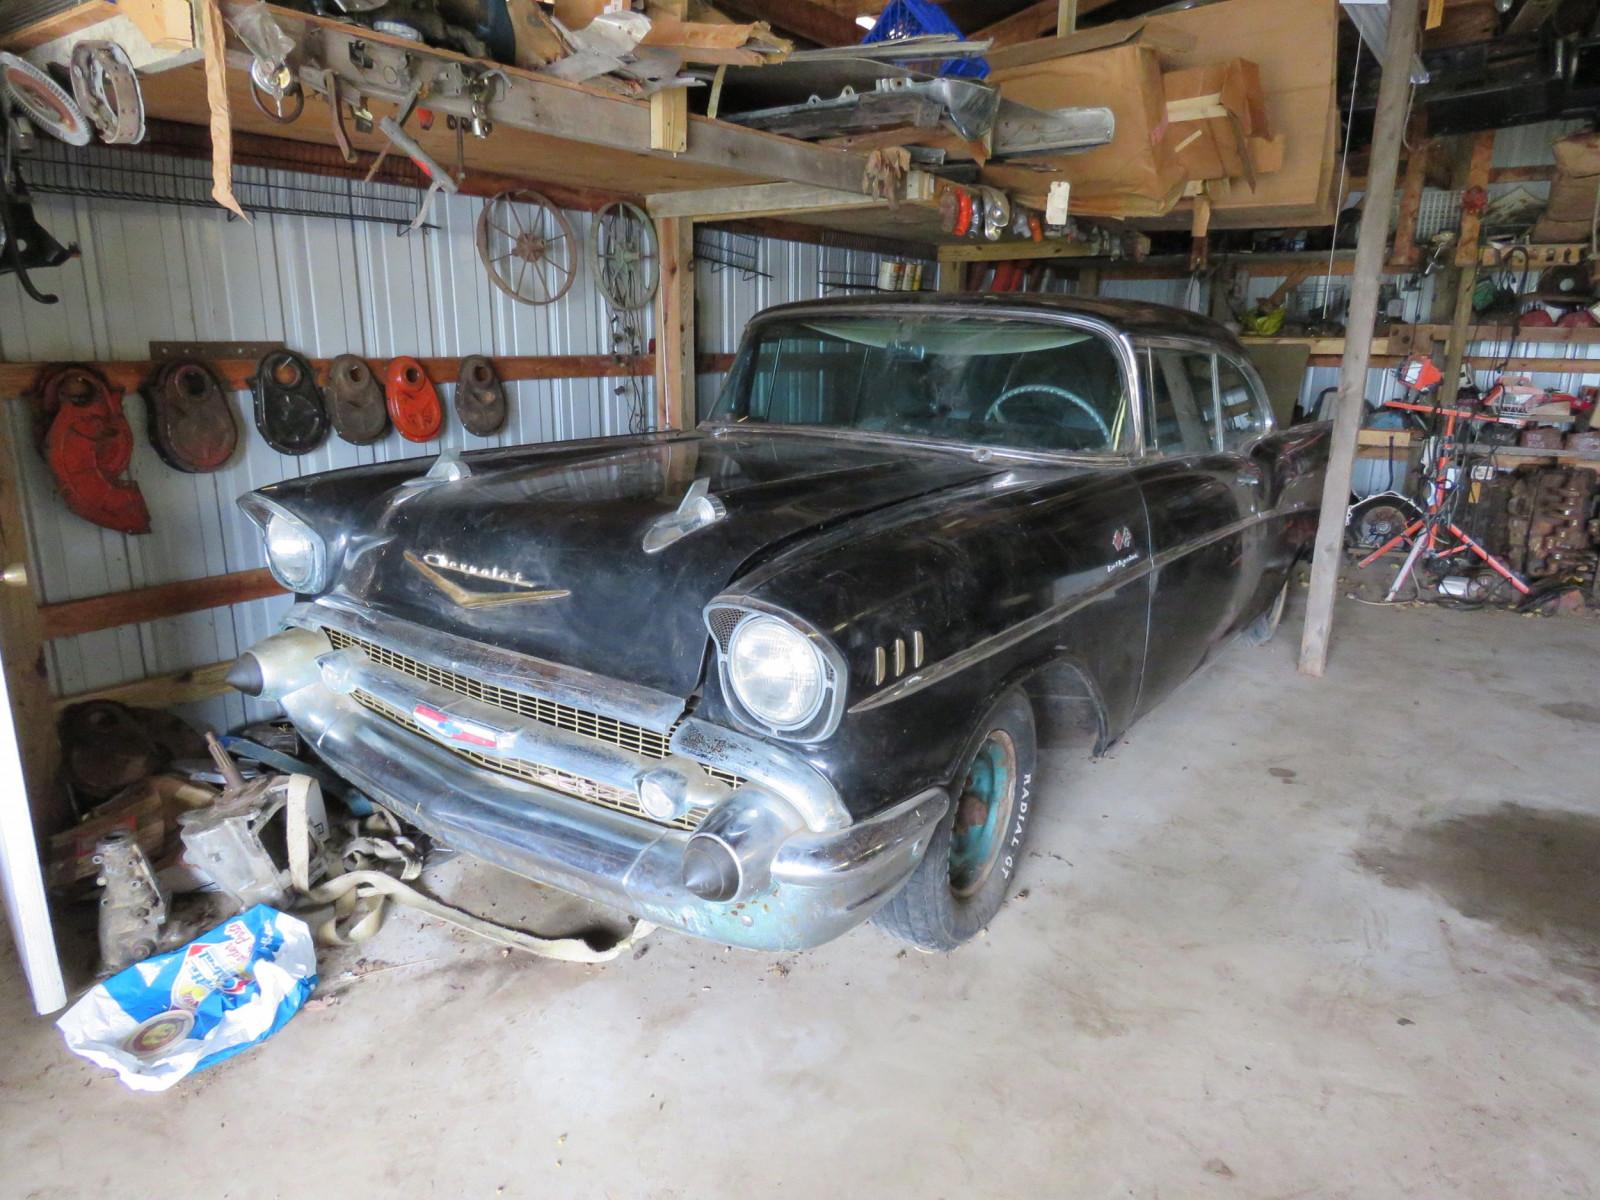 1957 Chevrolet Belair Fuel Injected 2dr Hardtop barn find